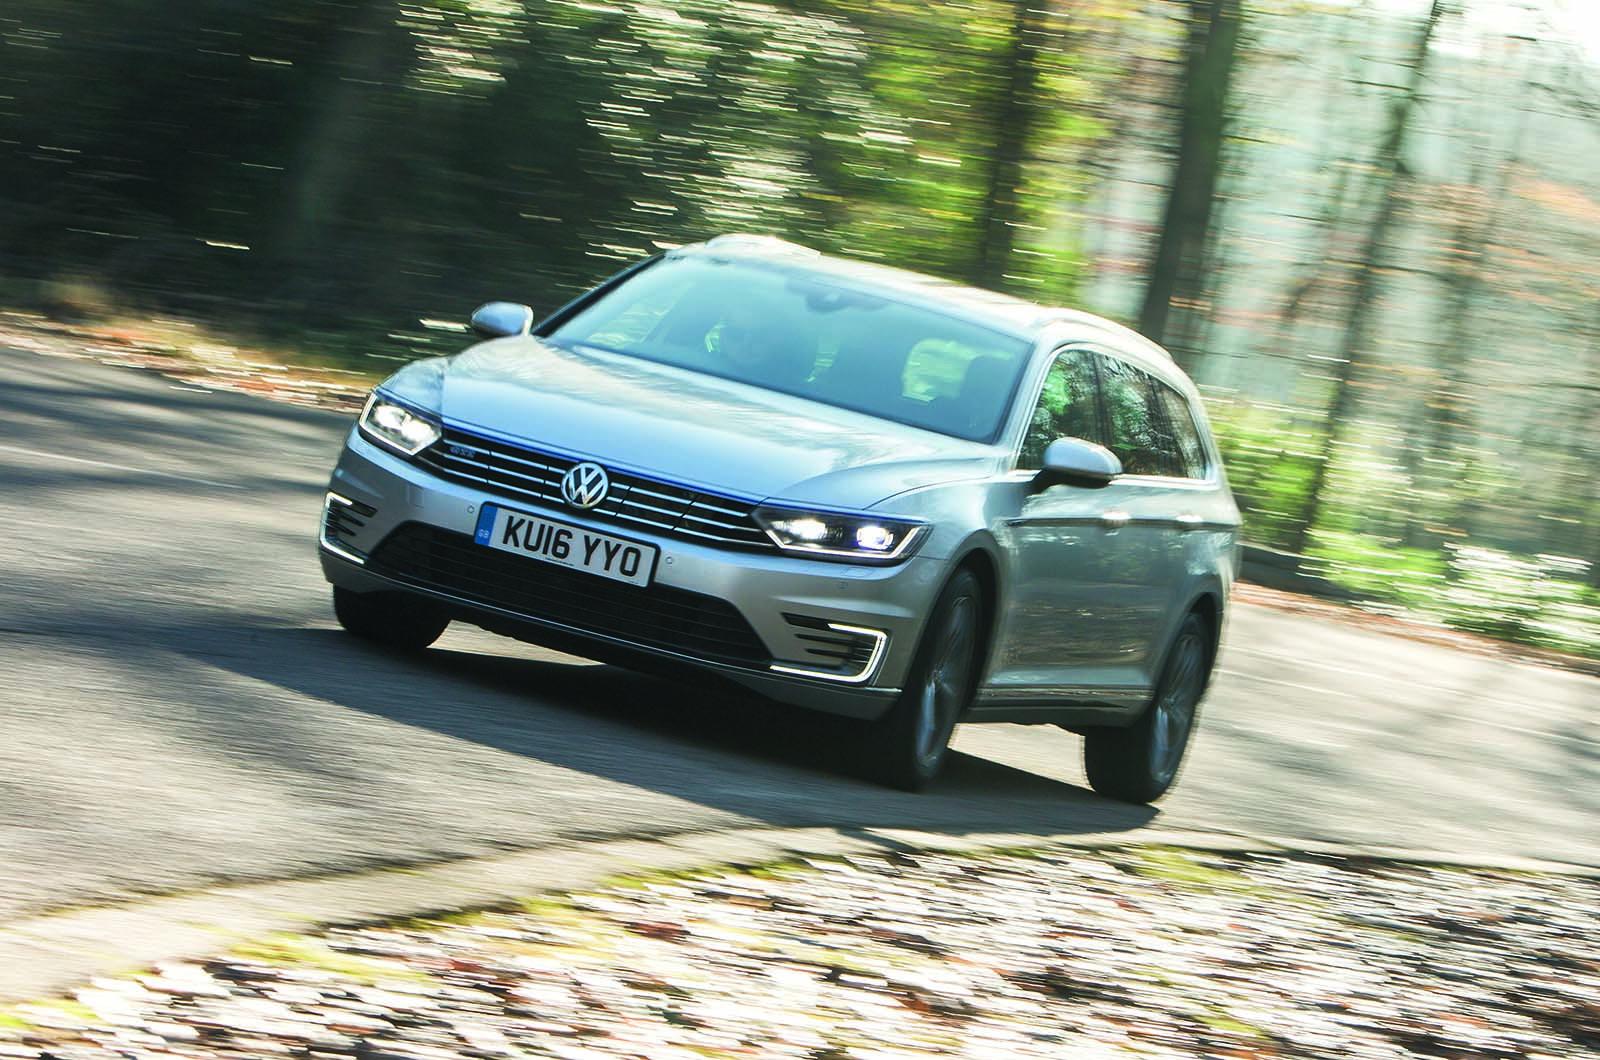 Volkswagen passat review 2017 autocar - Bmw 330e Plug In Hybrid Faces Audi Vw And Volvo 100mpg Rivals Autocar